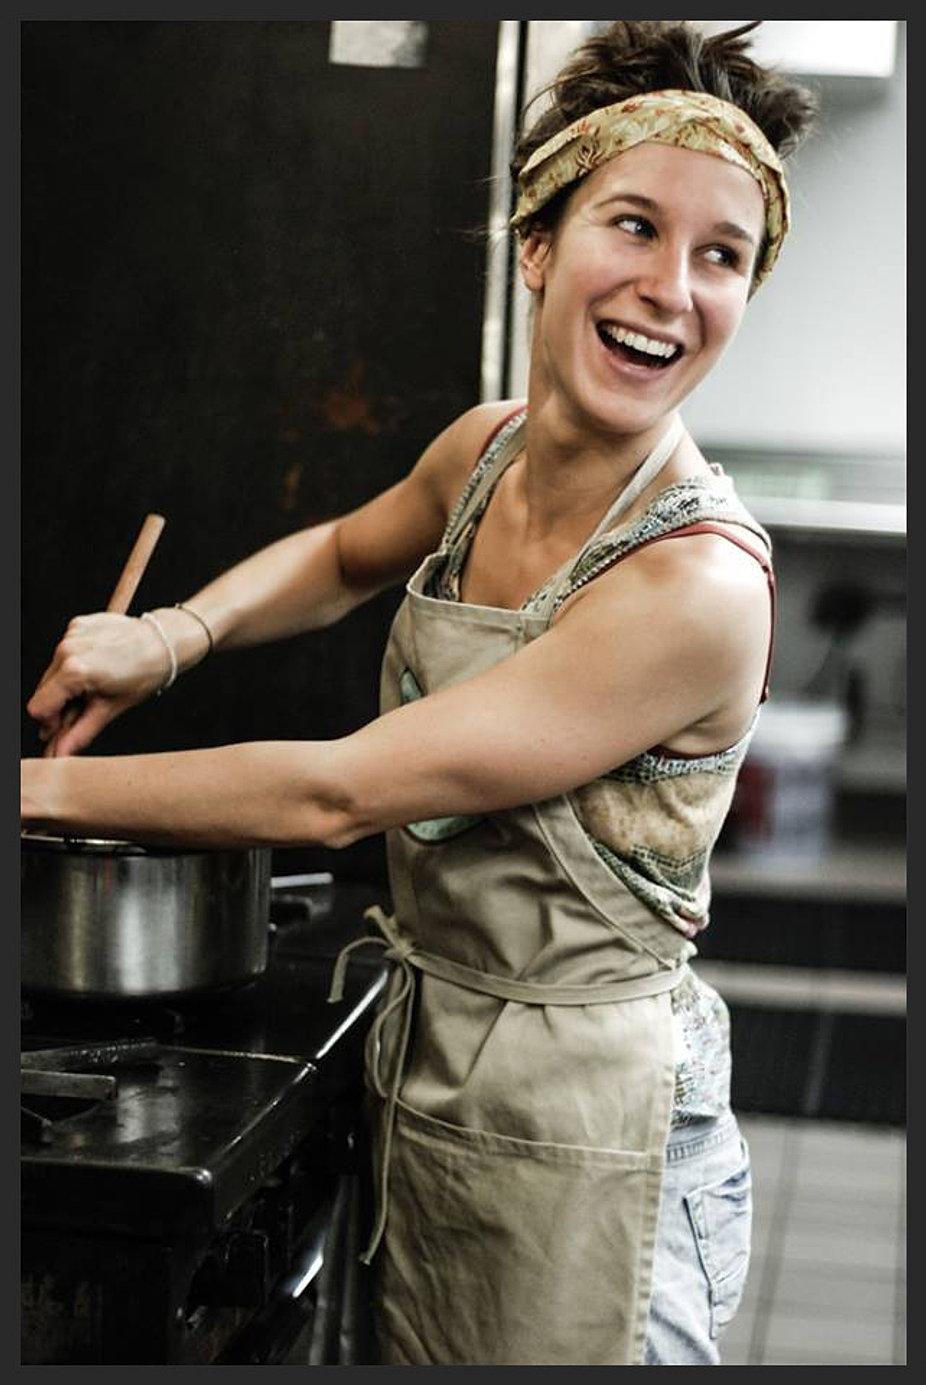 Chef Chloe mixing warm chocolate